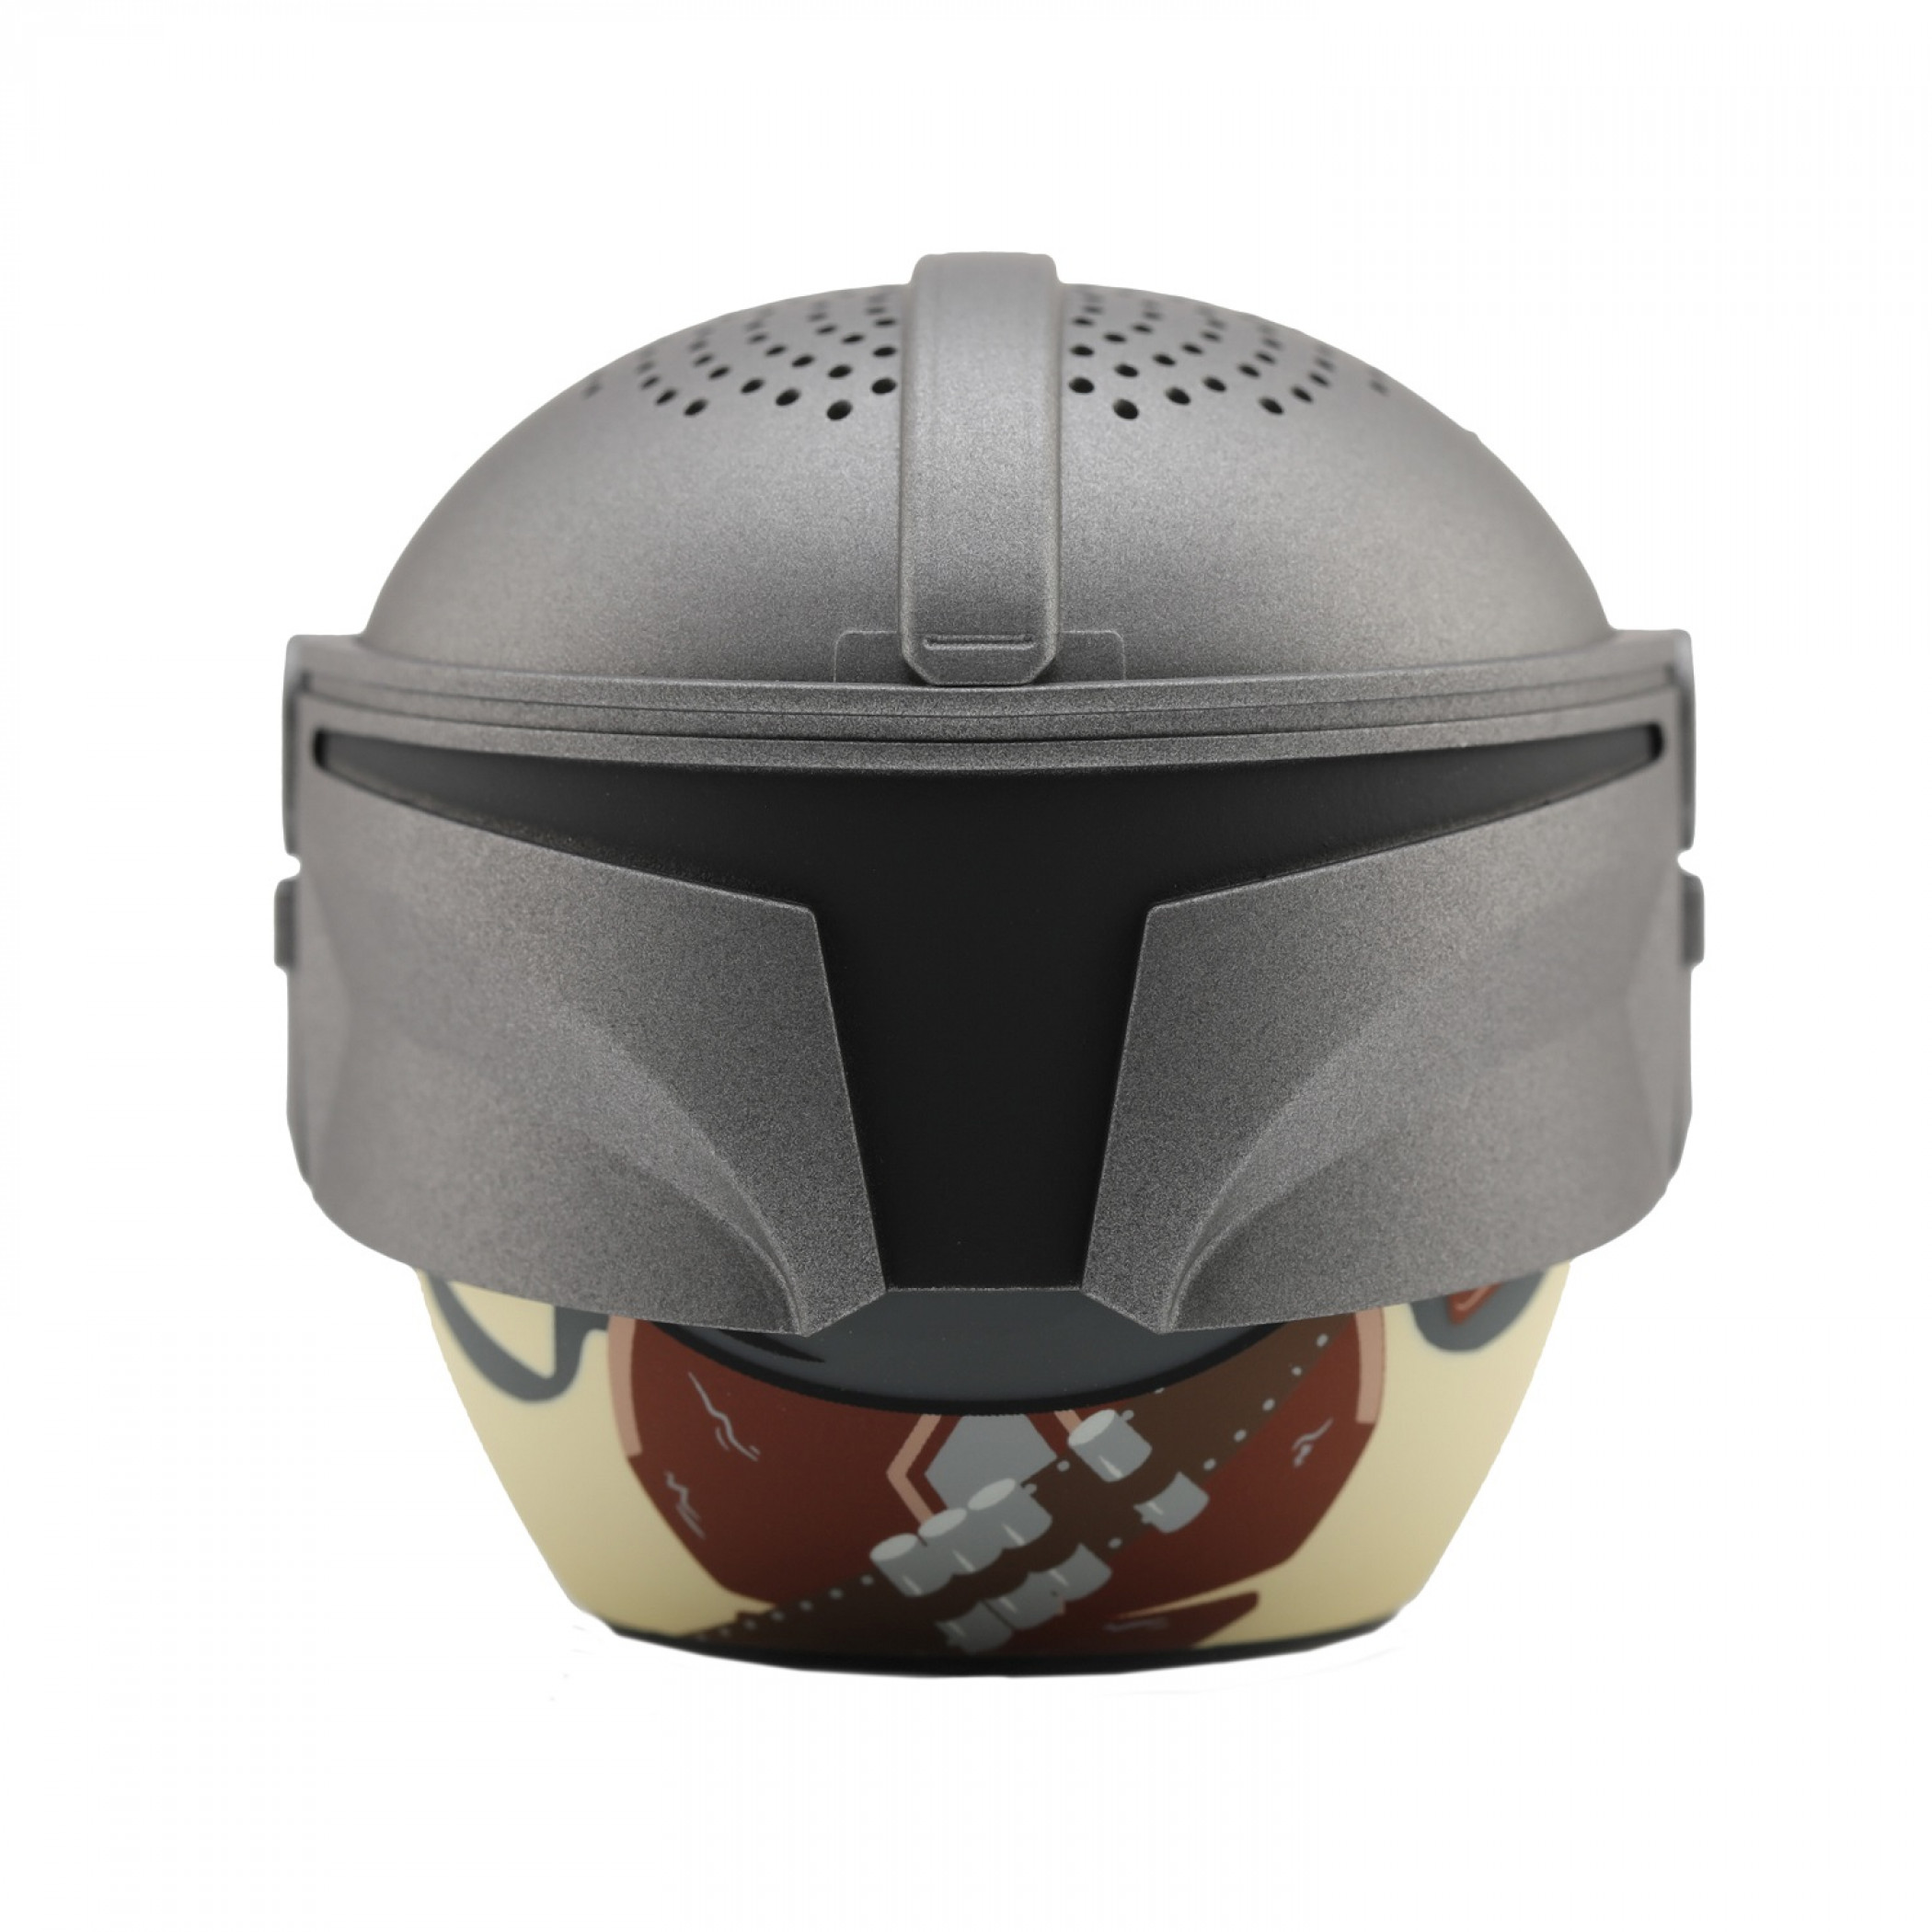 Star Wars The Mandalorian Bitty Boomers Bluetooth Speaker